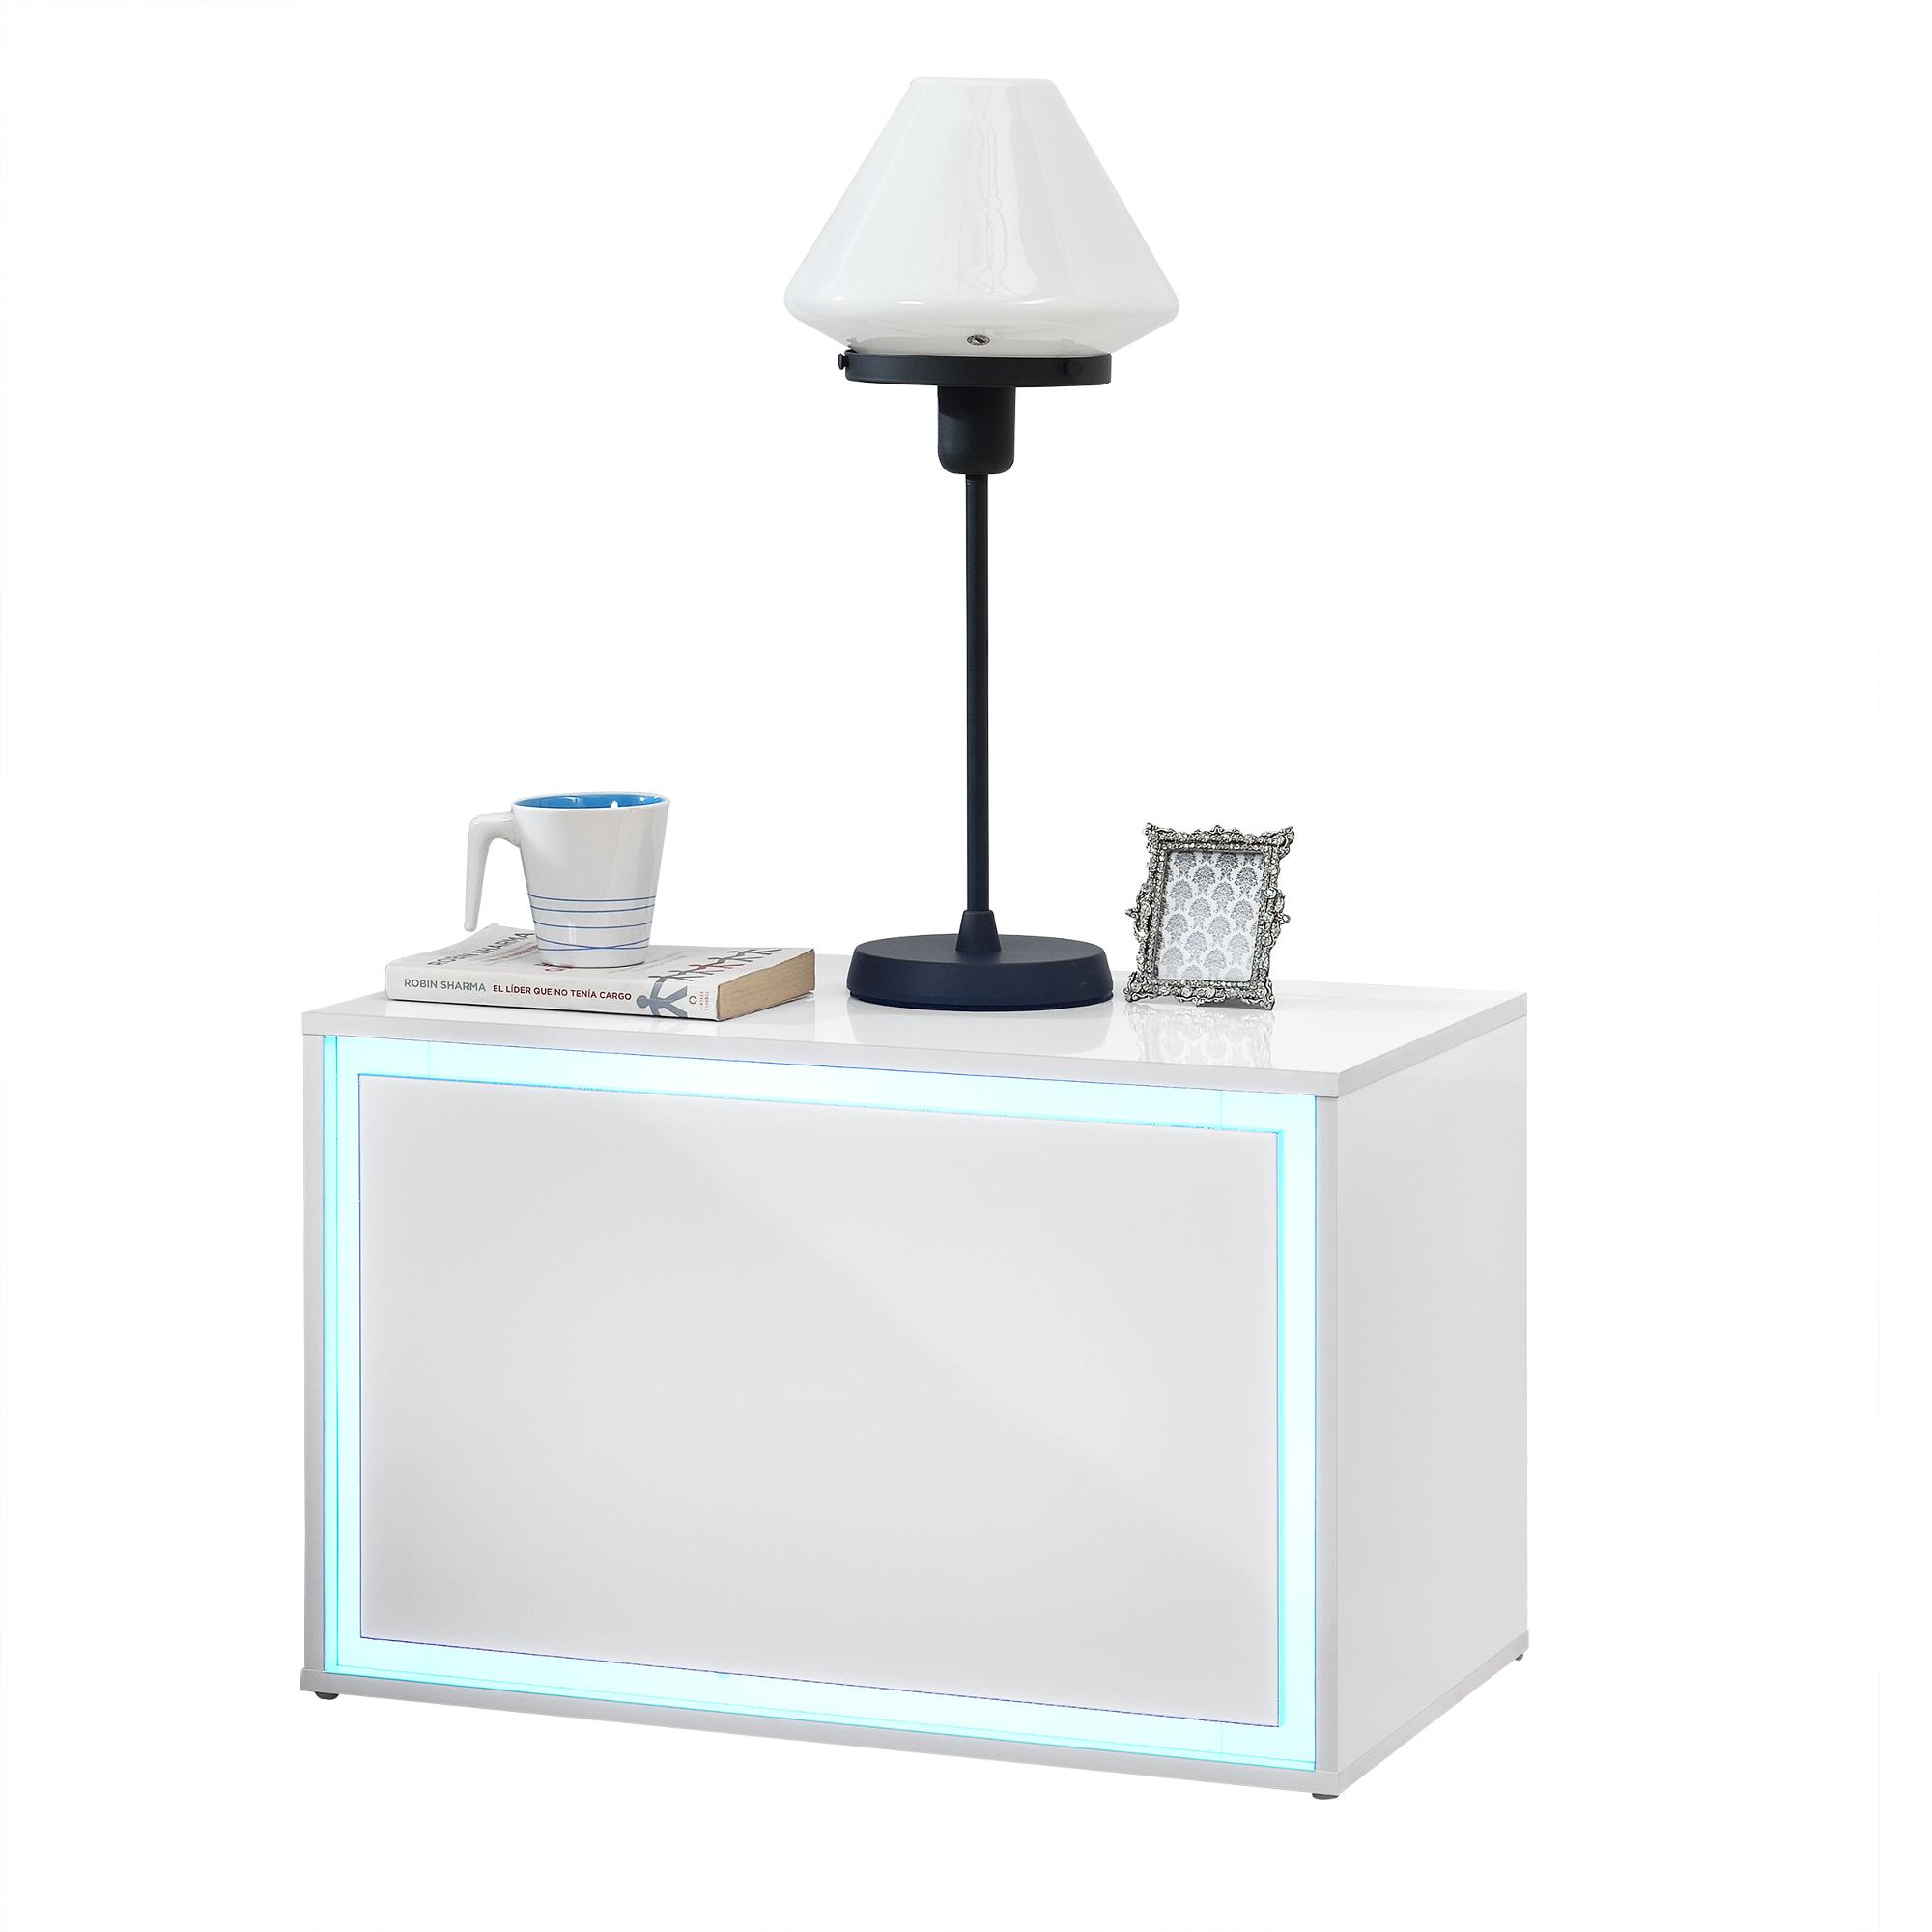 led table de chevet armoire nuit tiroir commode. Black Bedroom Furniture Sets. Home Design Ideas